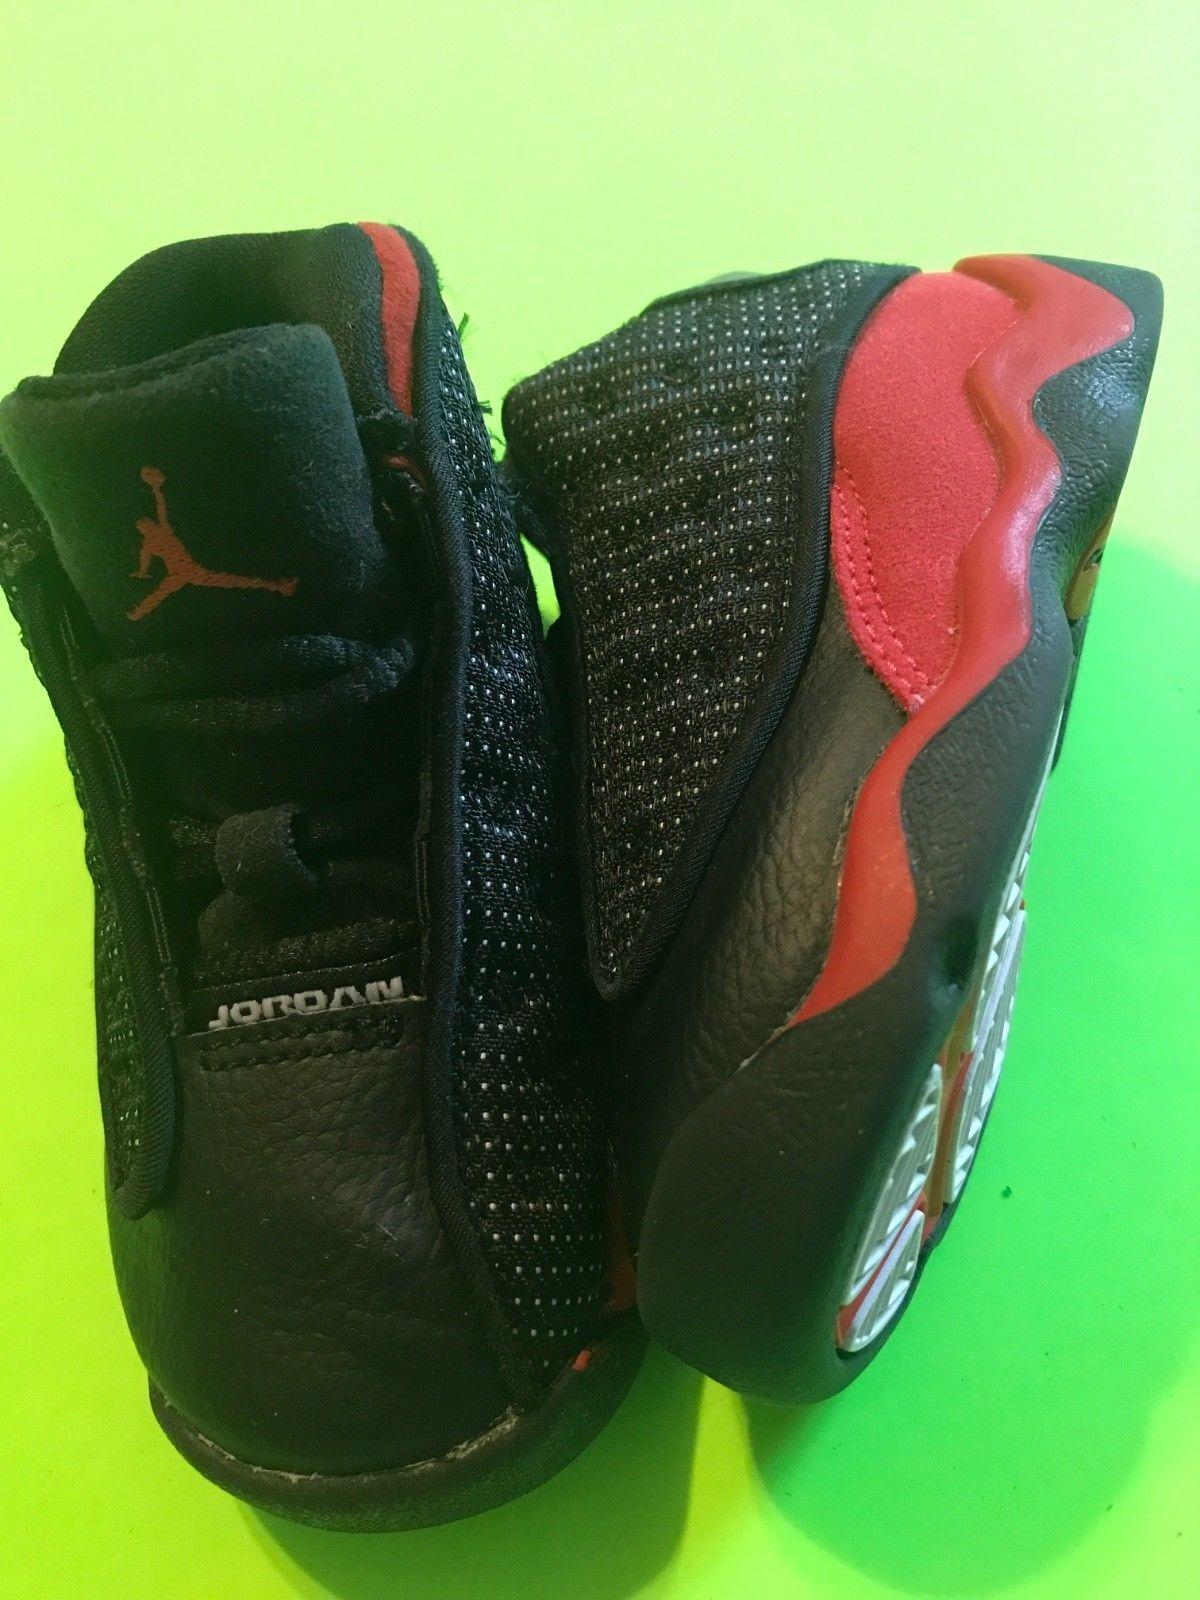 promo code 2b9e1 4b87d Nike Air Jordan Retro XIII (13) BRED Boys Toddler Shoes Size ...